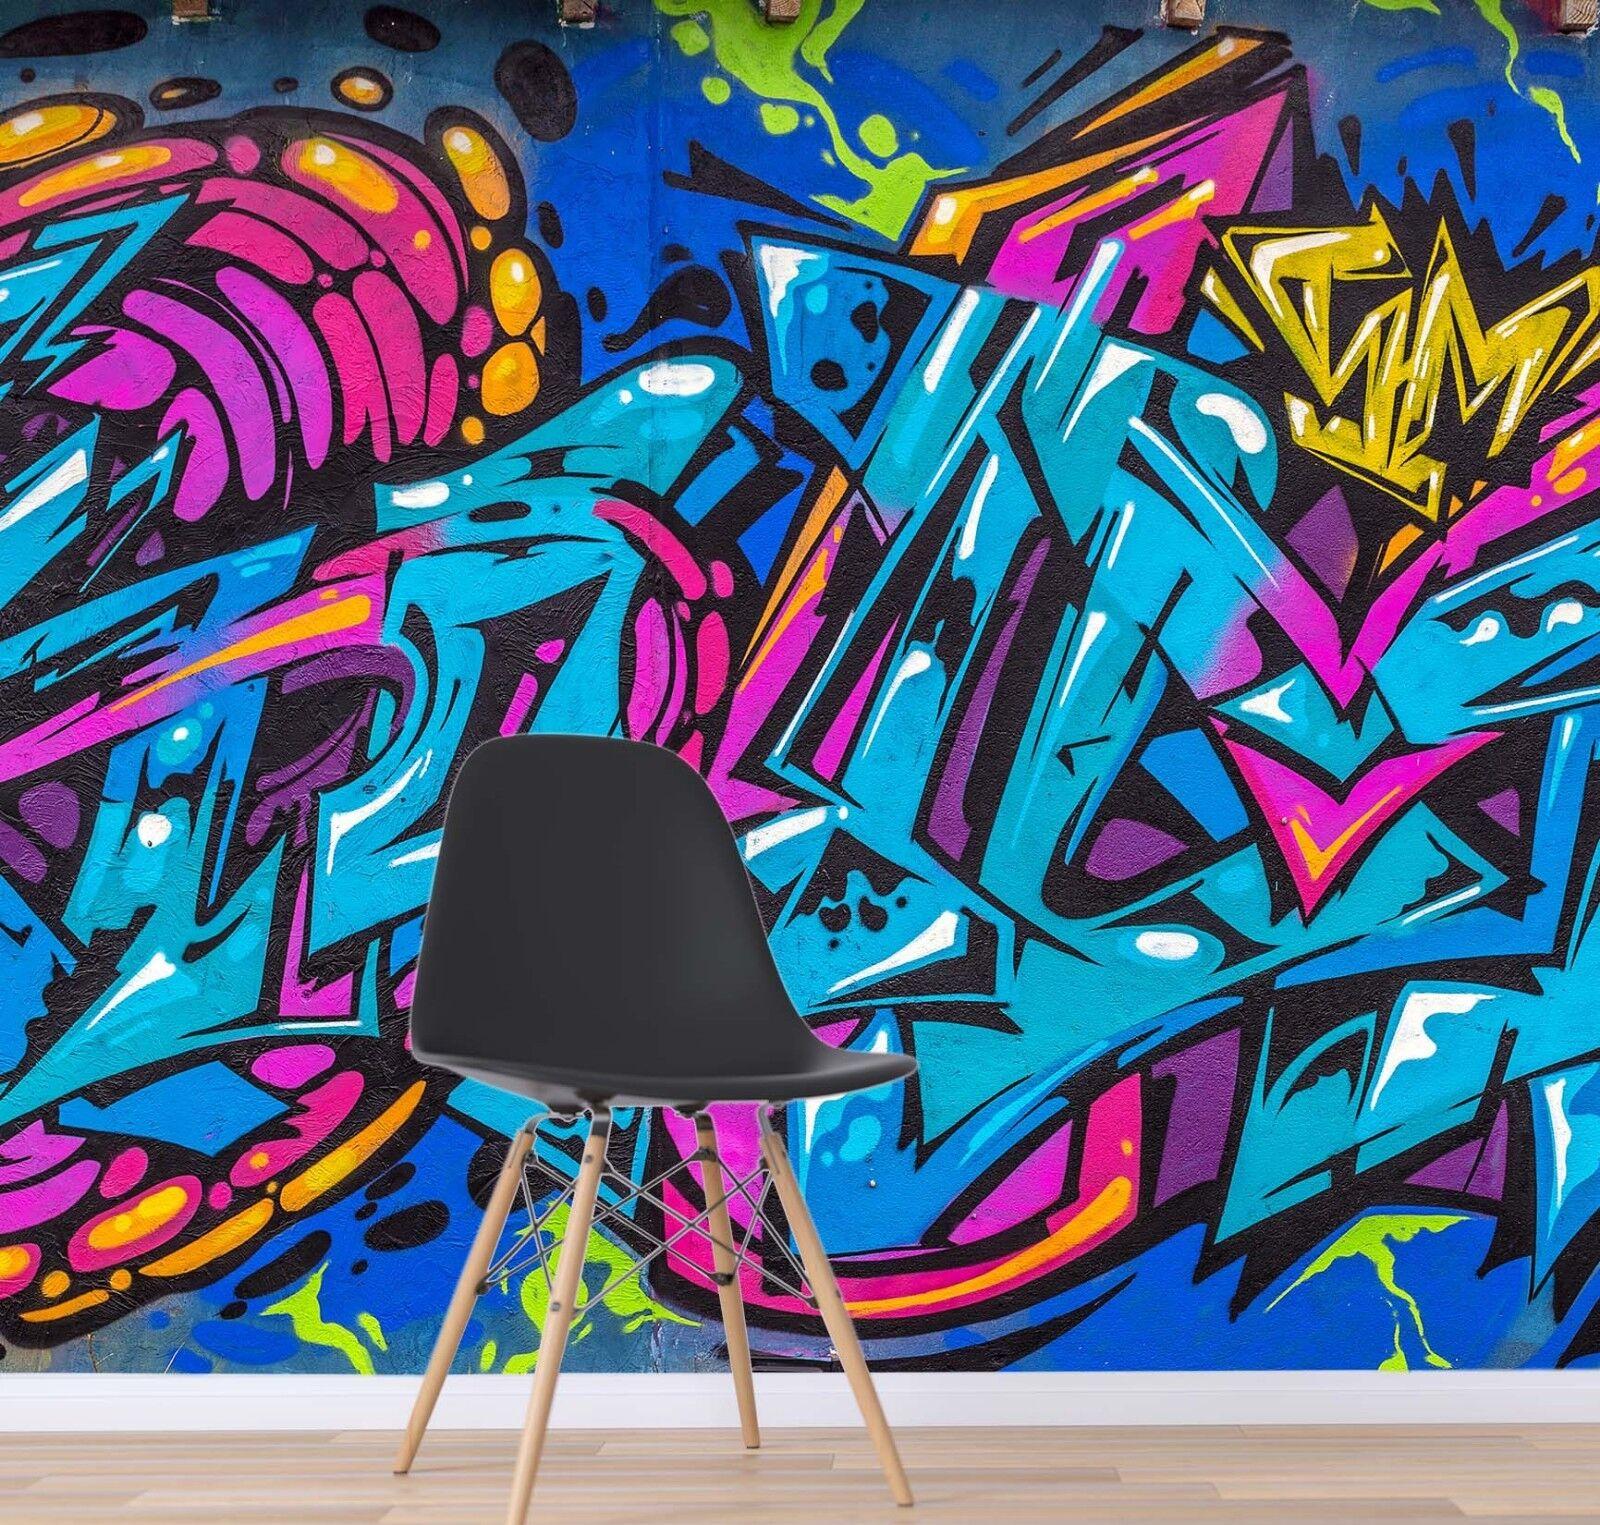 3D Blau Graffiti 7003 Wallpaper Mural Paper Wall Print Indoor Murals CA Summer